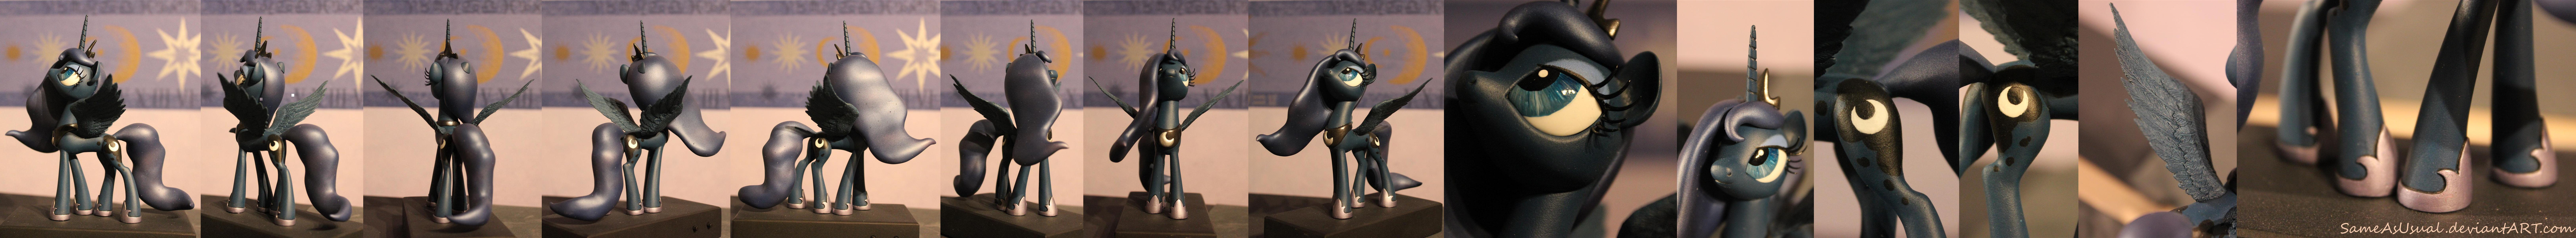 Luna figure detail by SameAsUsual